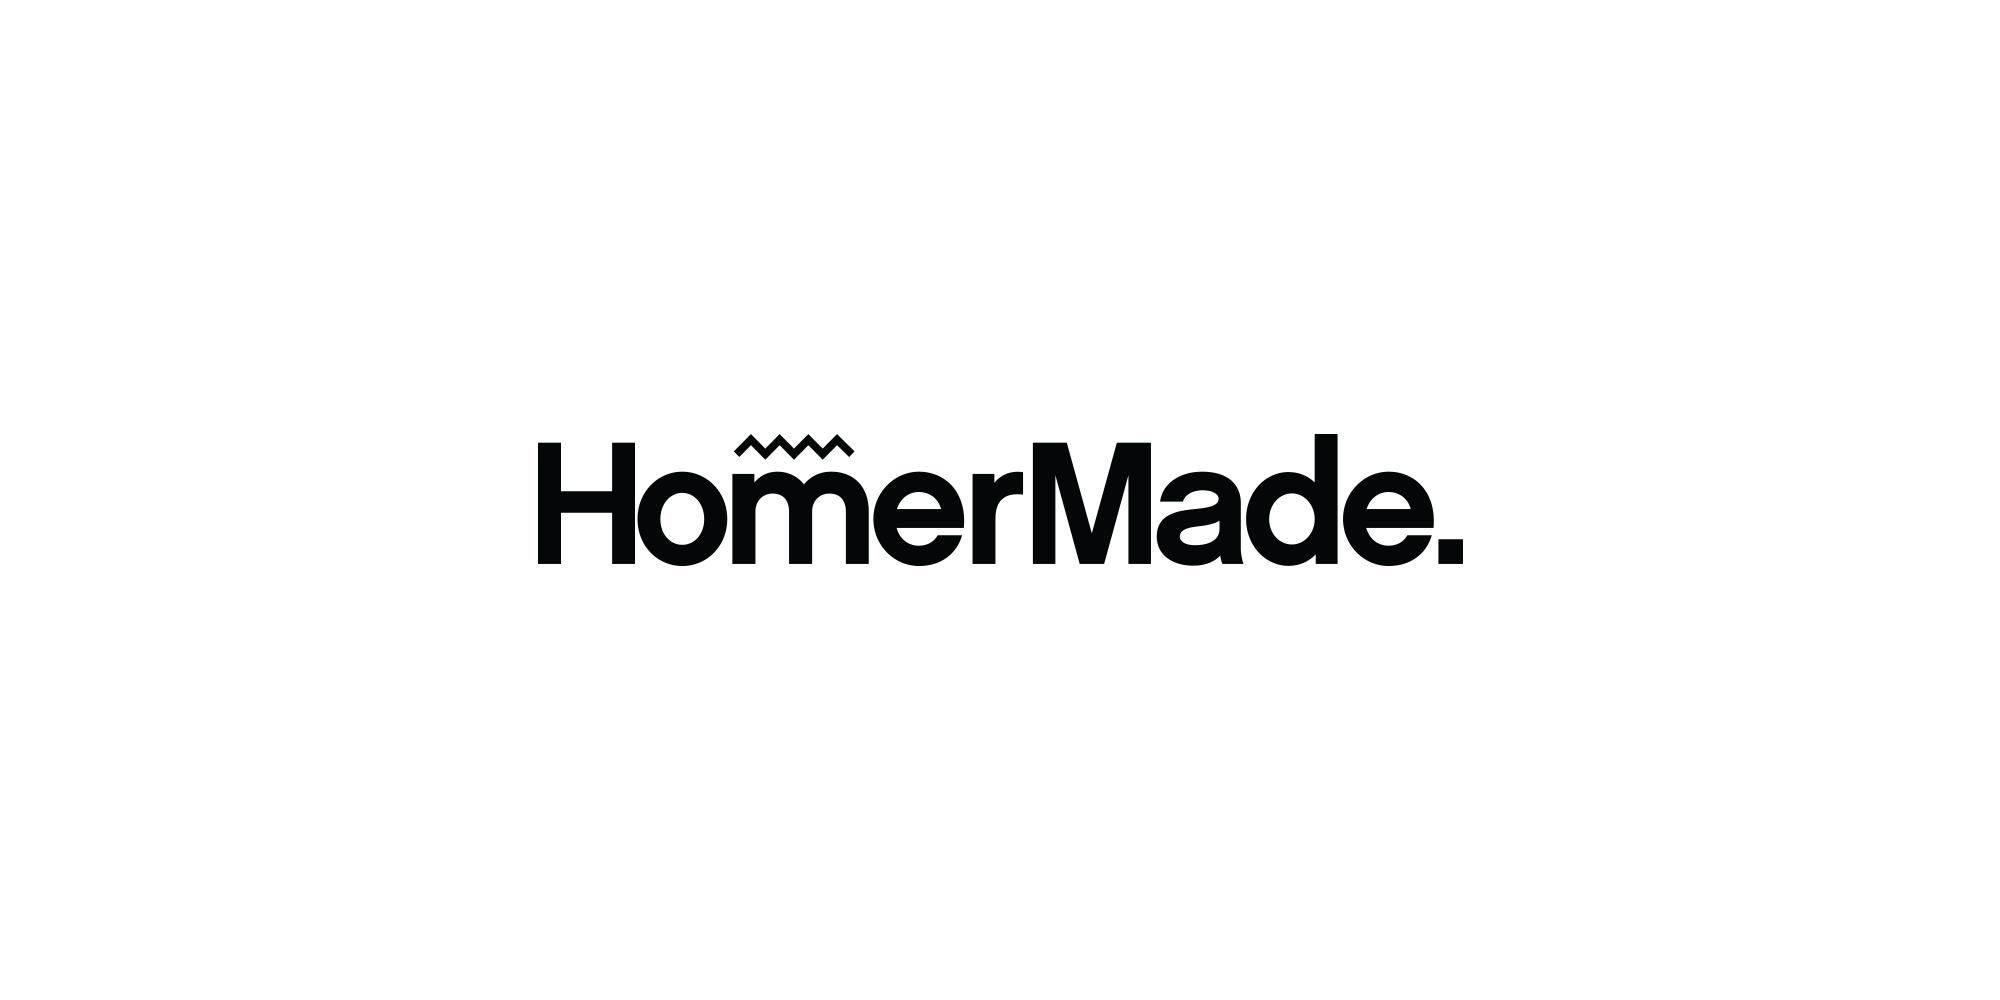 HomerMade Branding